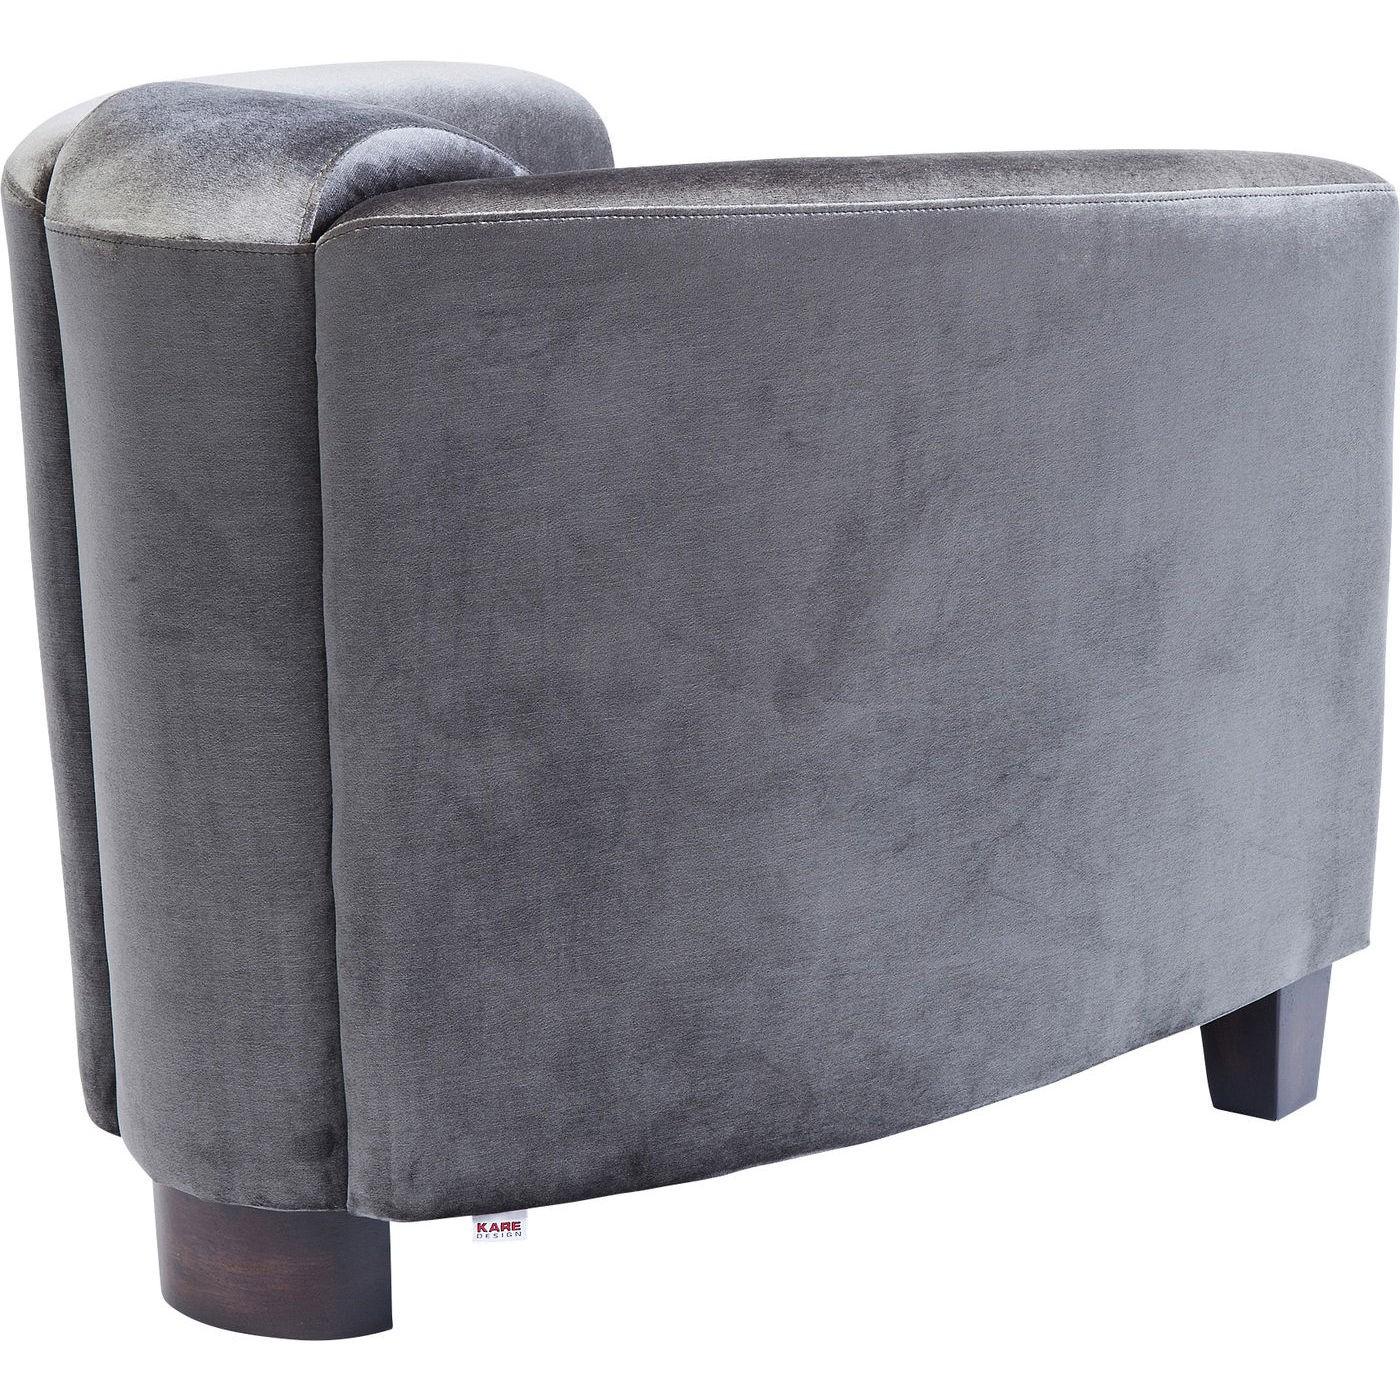 Fauteuil Fauteuil Lounge Lounge Design Design Fauteuil Ajq4cR35SL